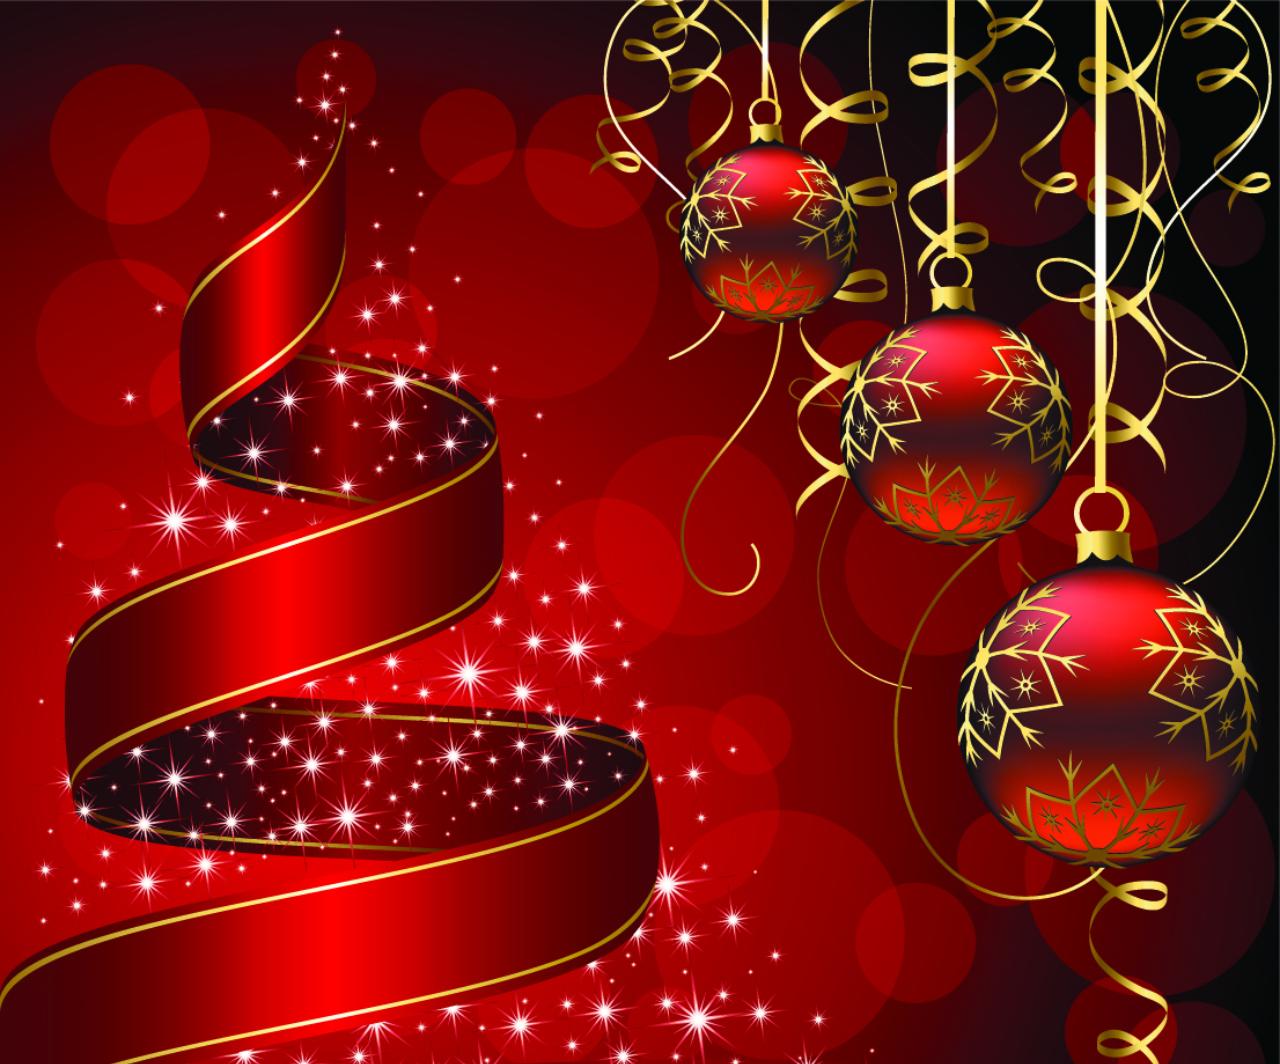 merry-christmas-pics-c41zd7hm